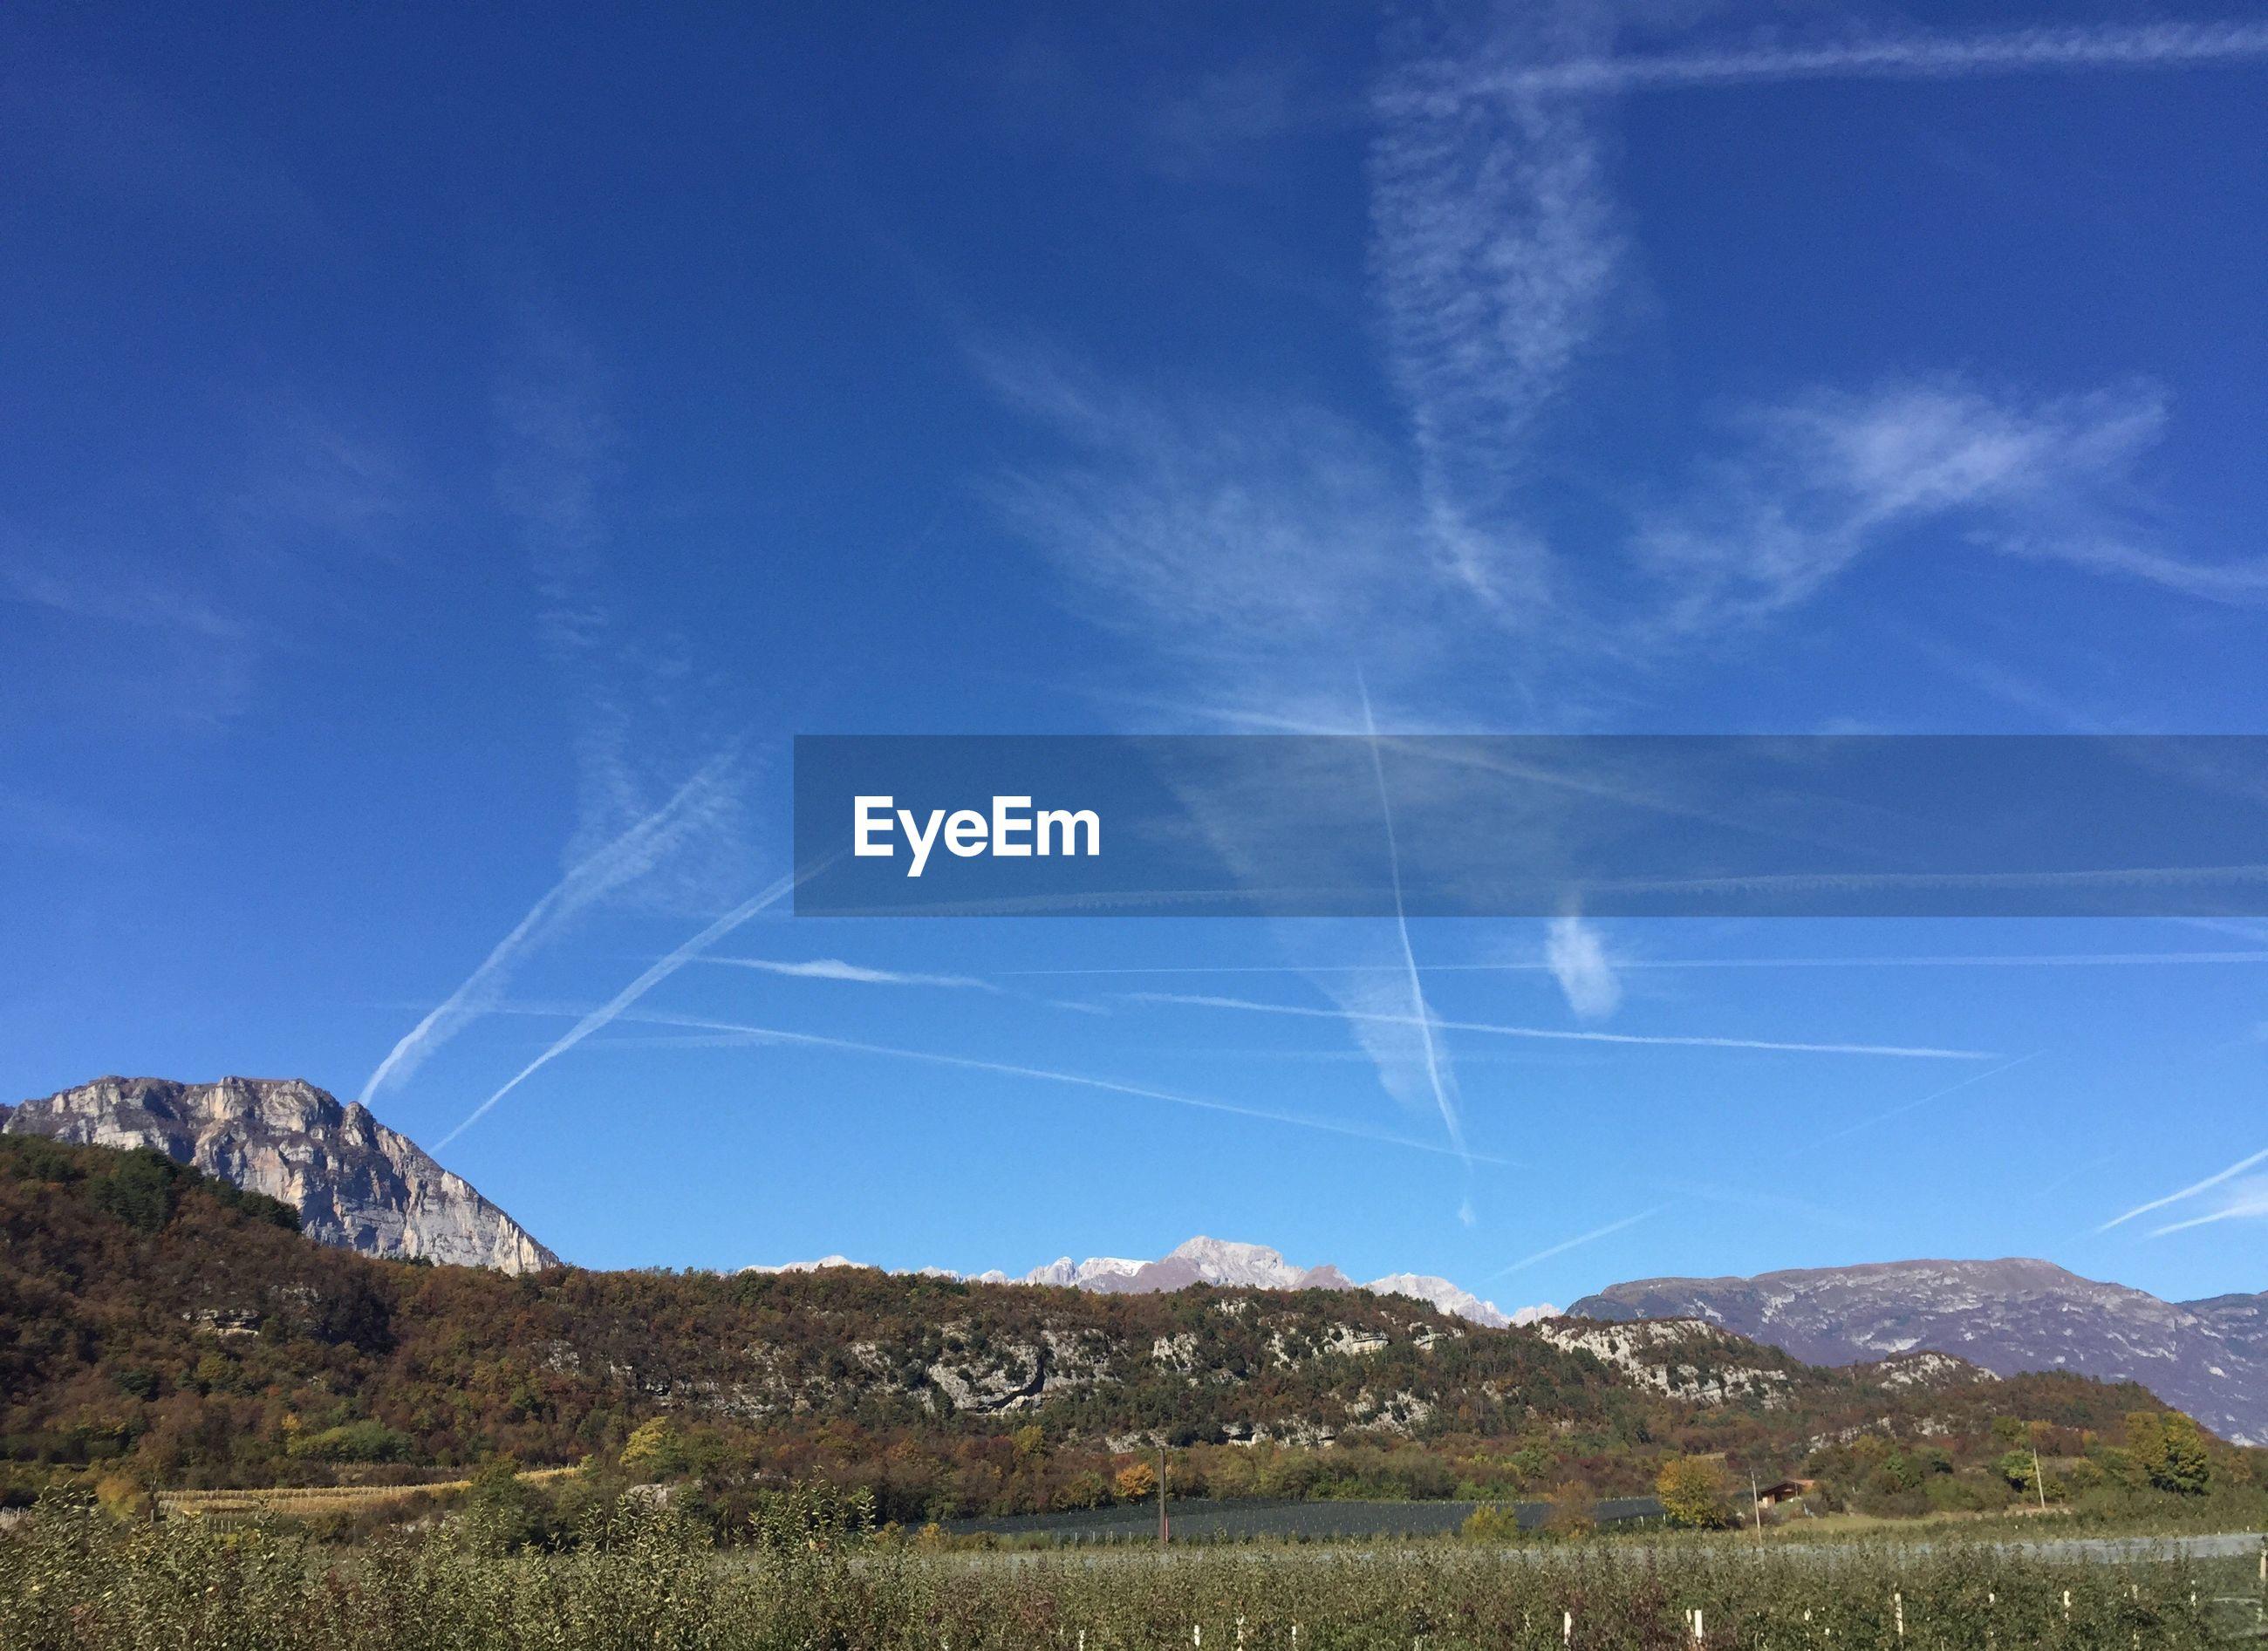 VAPOR TRAILS IN SKY